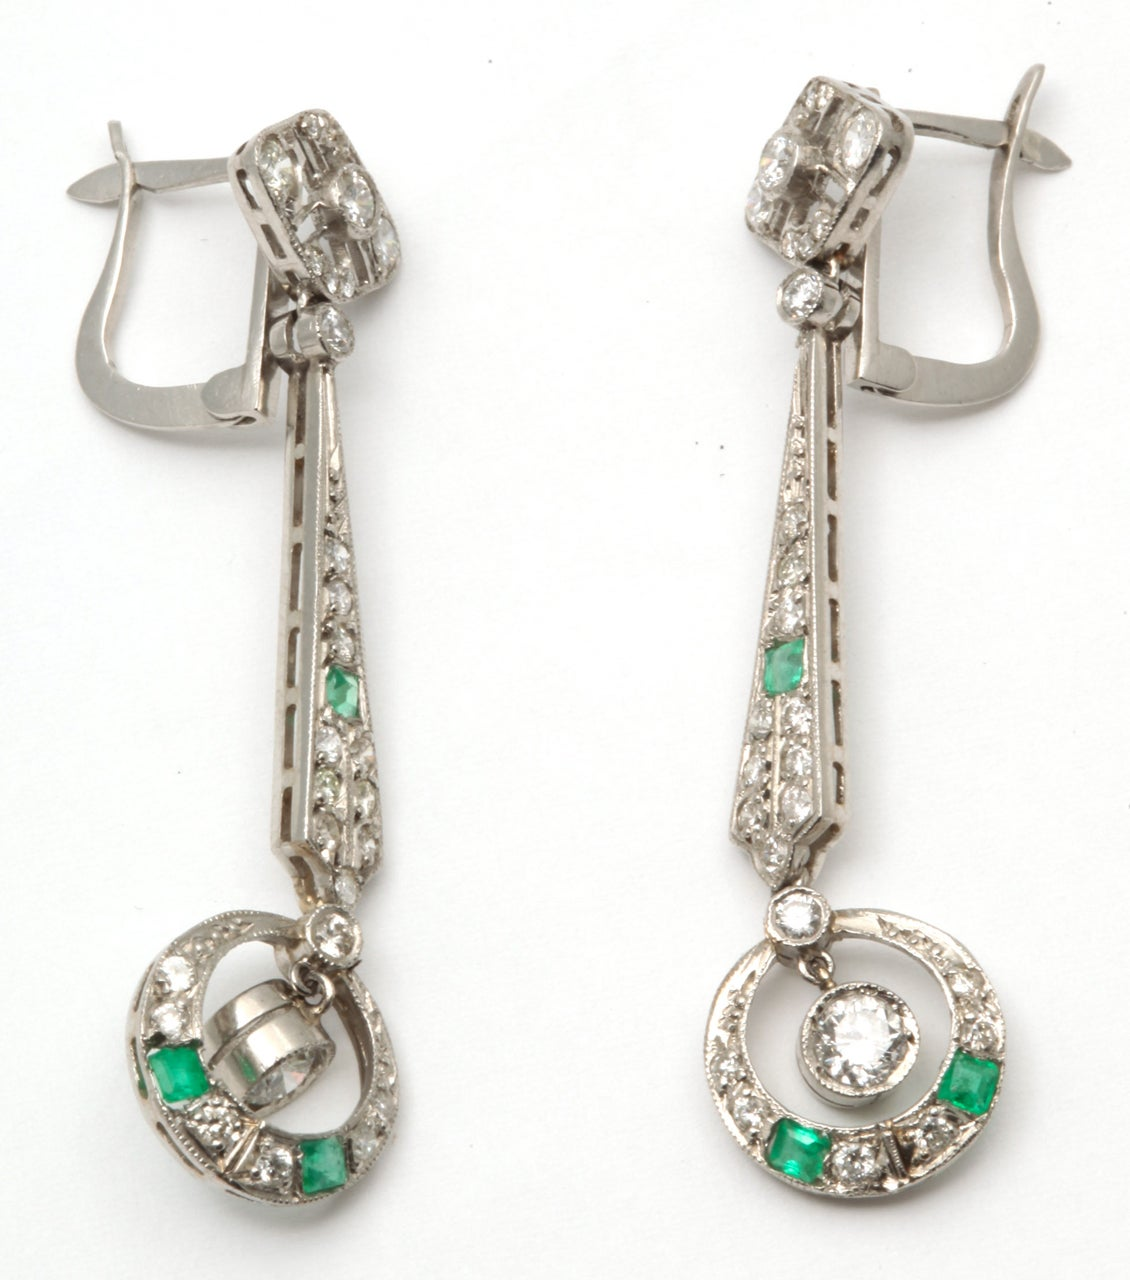 art deco emerald and diamond dangle earrings at 1stdibs. Black Bedroom Furniture Sets. Home Design Ideas